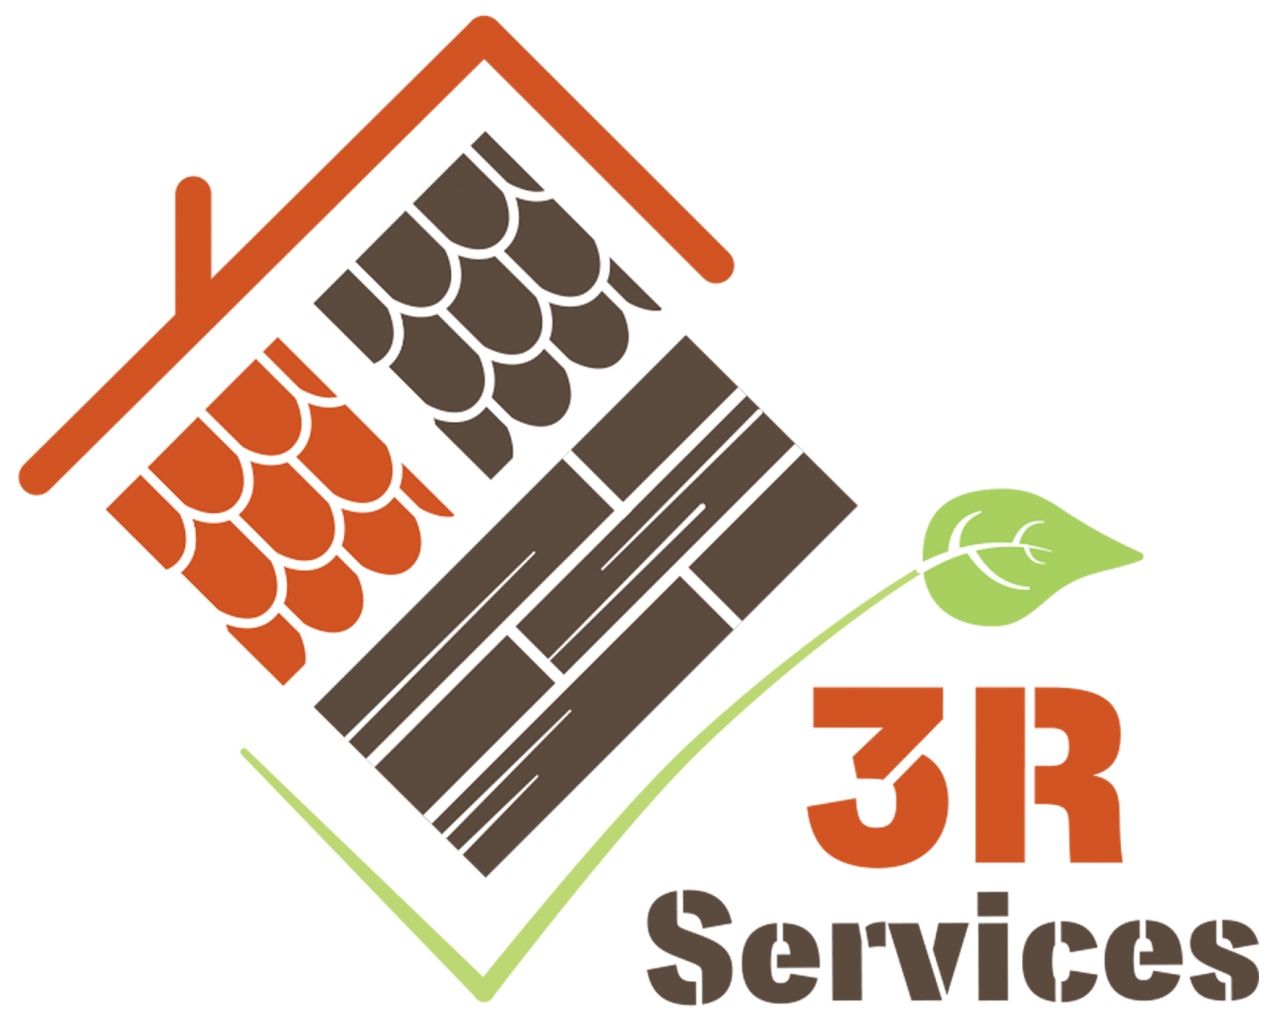 3R services